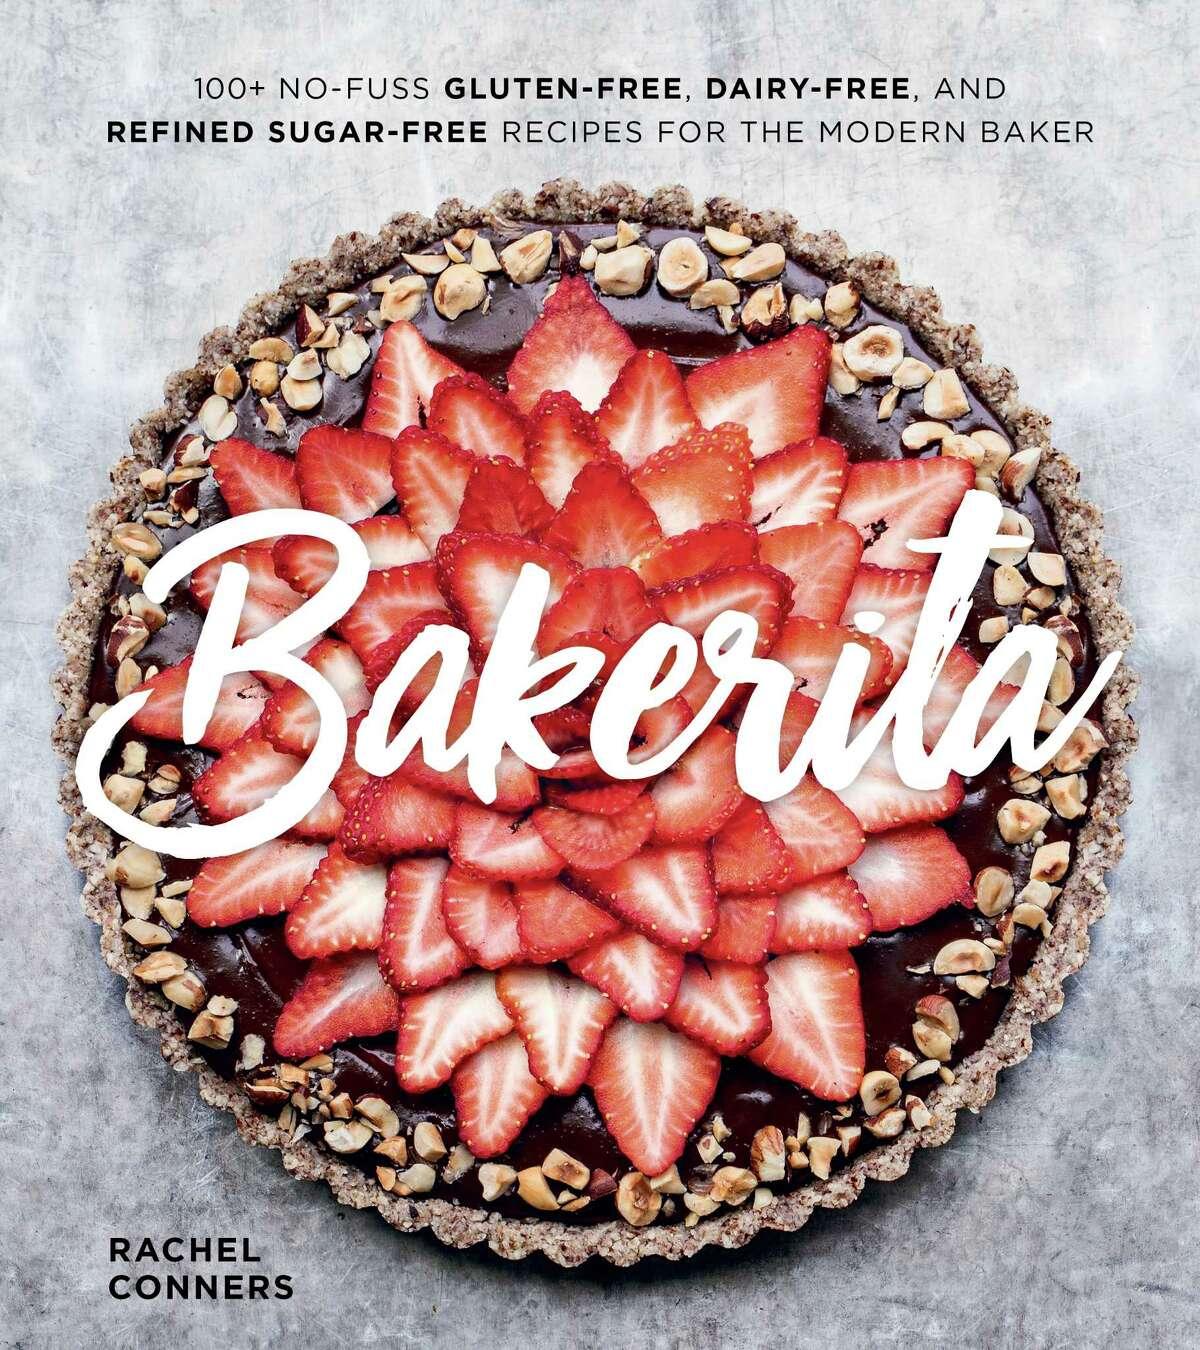 """Bakerita"" by Rachel Conners (Houghton Mifflin Harcourt Books)"